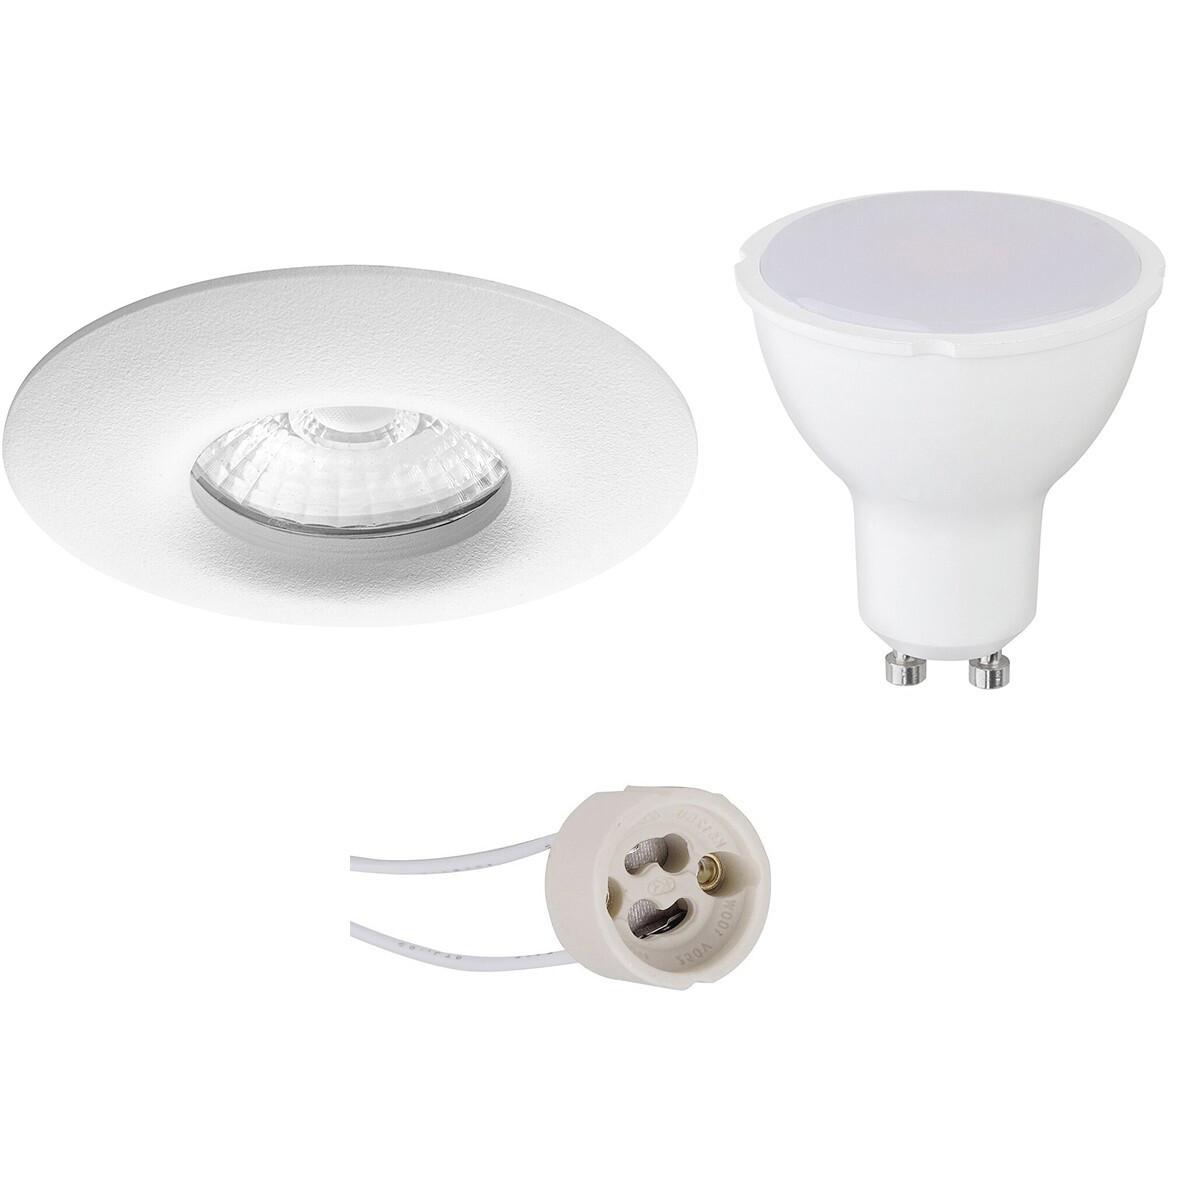 LED Spot Set - Pragmi Luno Pro - Waterdicht IP65 - GU10 Fitting - Inbouw Rond - Mat Wit - 4W - Natuu